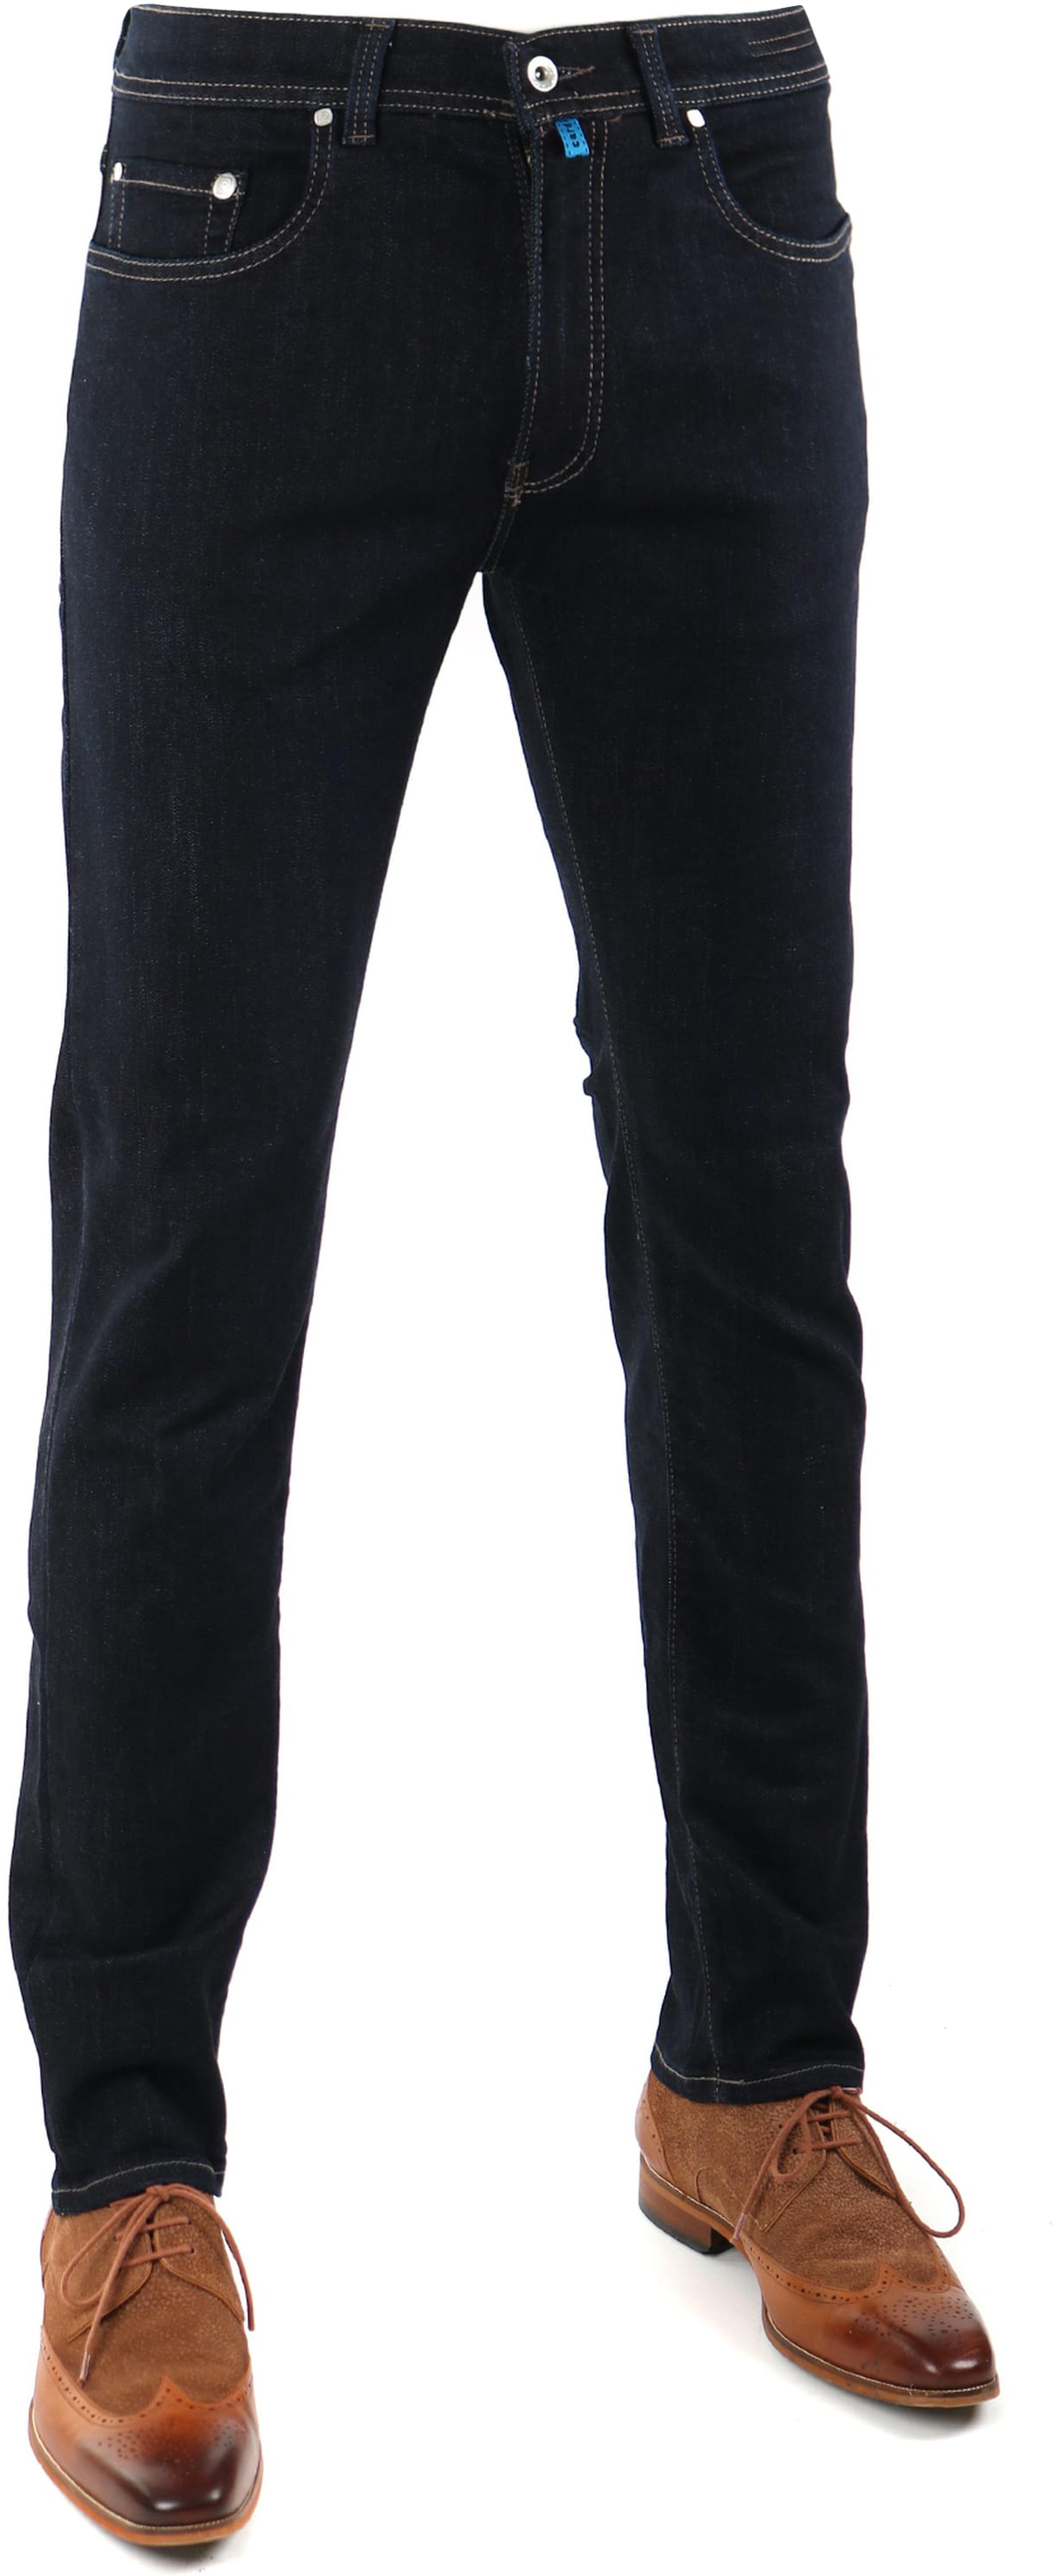 speical offer designer fashion on feet at Pierre Cardin Lyon Jeans Future Flex 04 03451/000/08880 ...